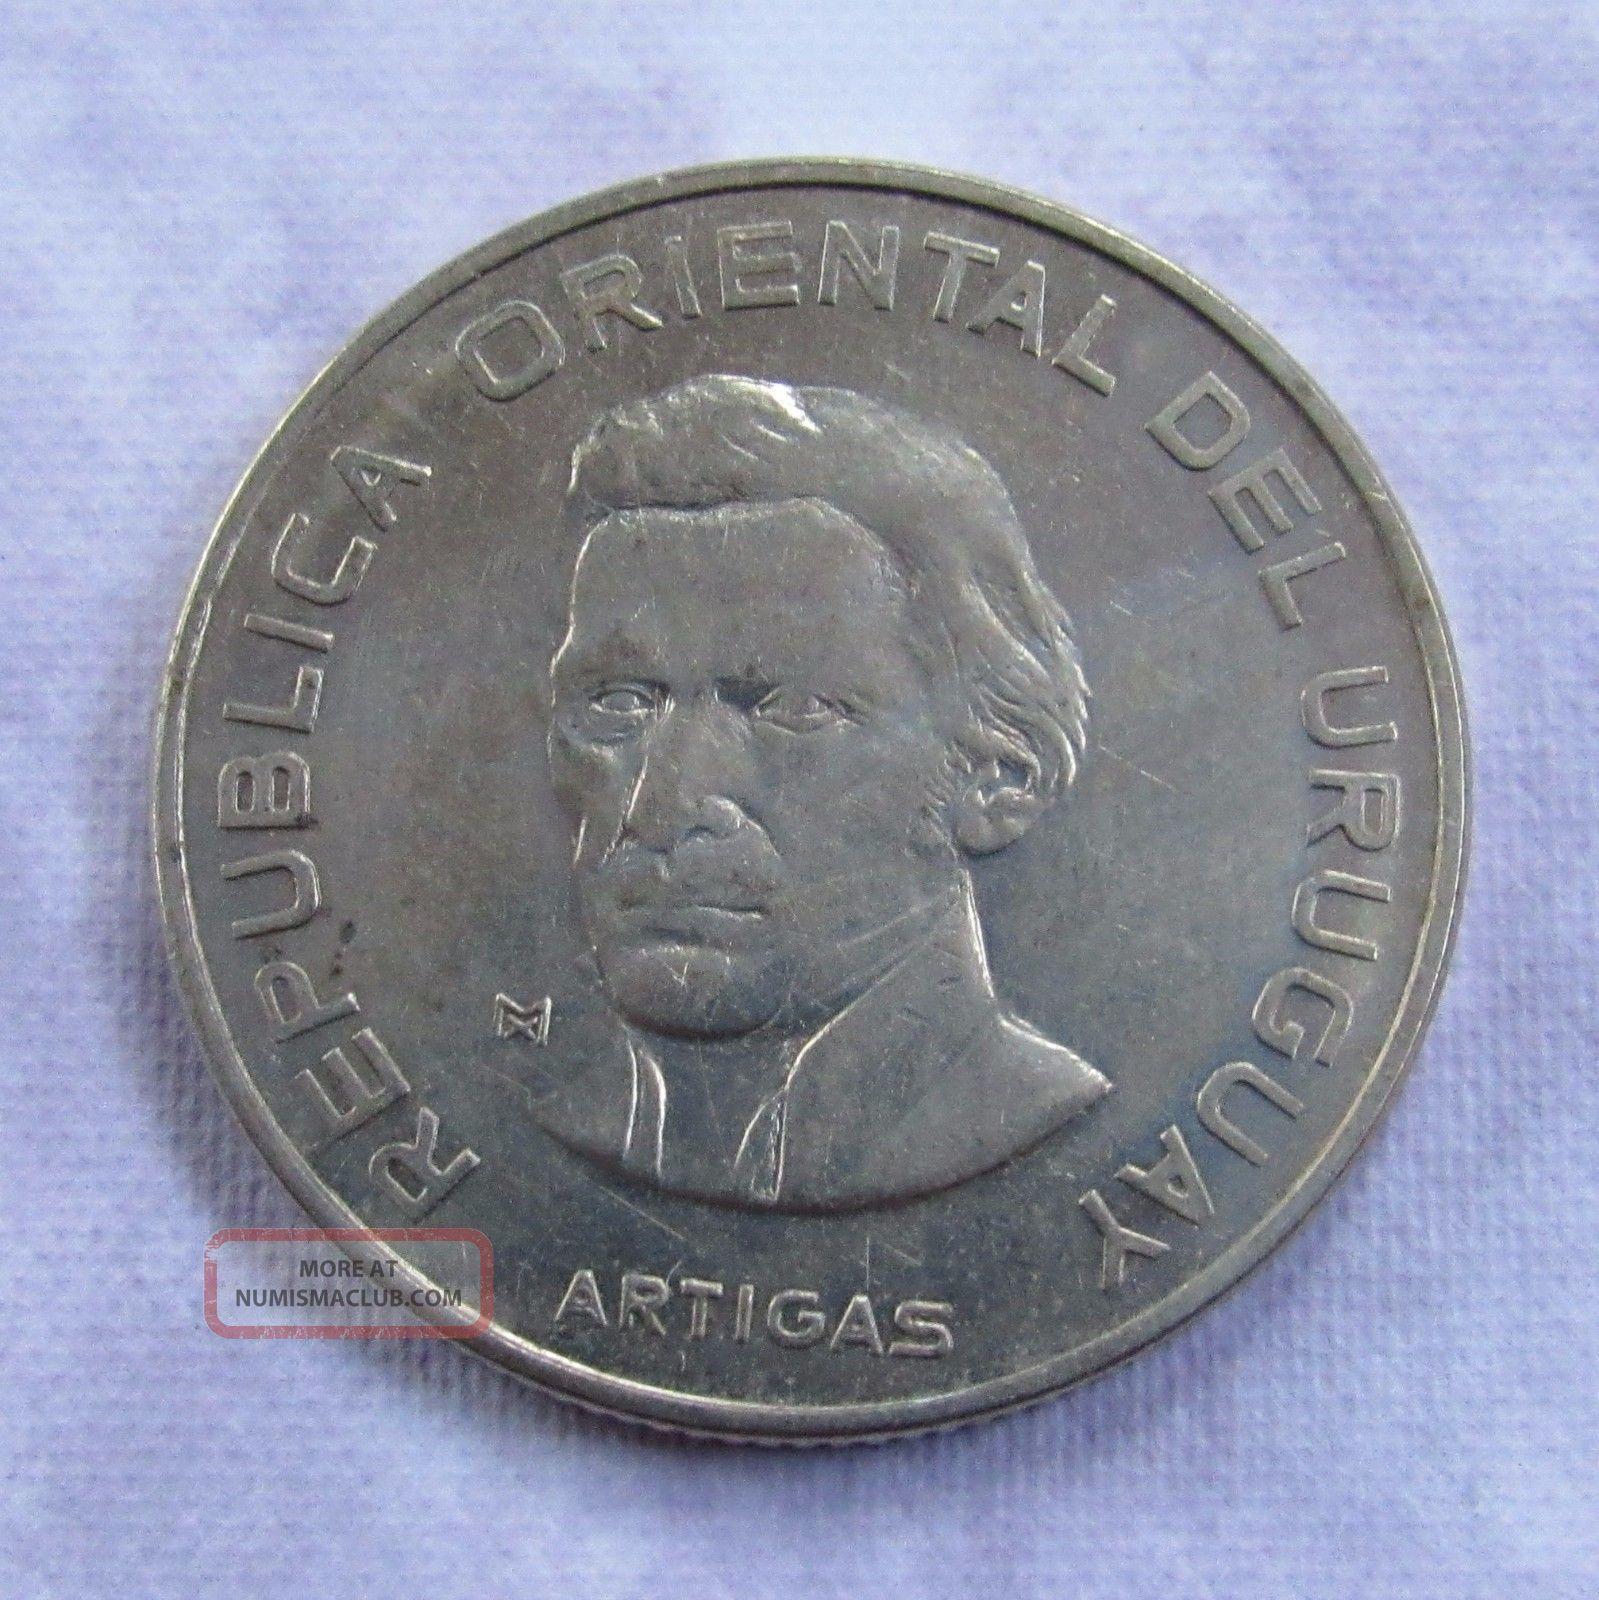 Uruguay 100 Pesos,  1973 - Domestic Uruguay photo